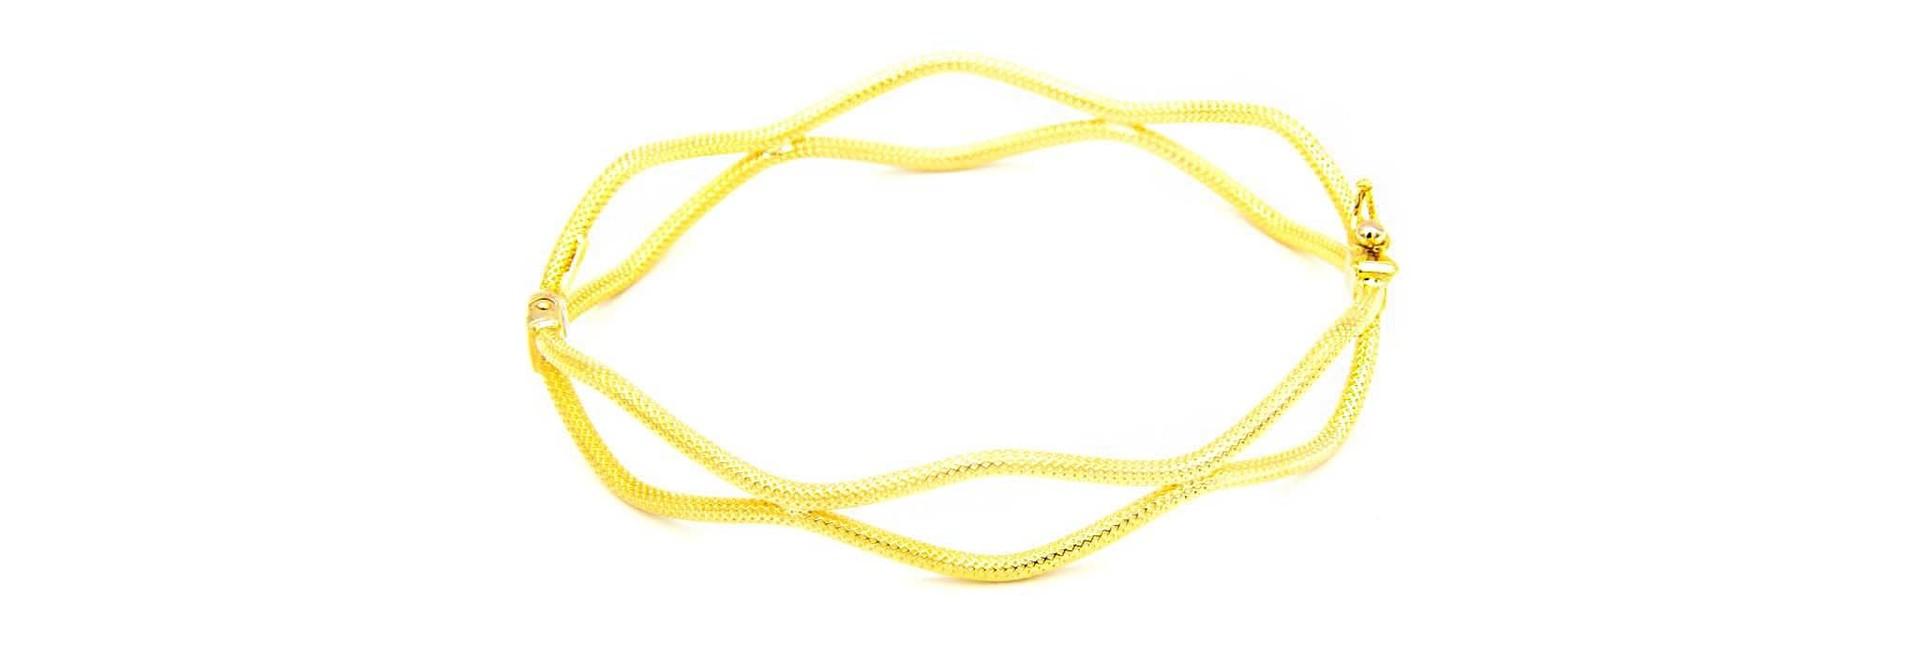 Armband vaste bewerkte dubbele gegolfde band